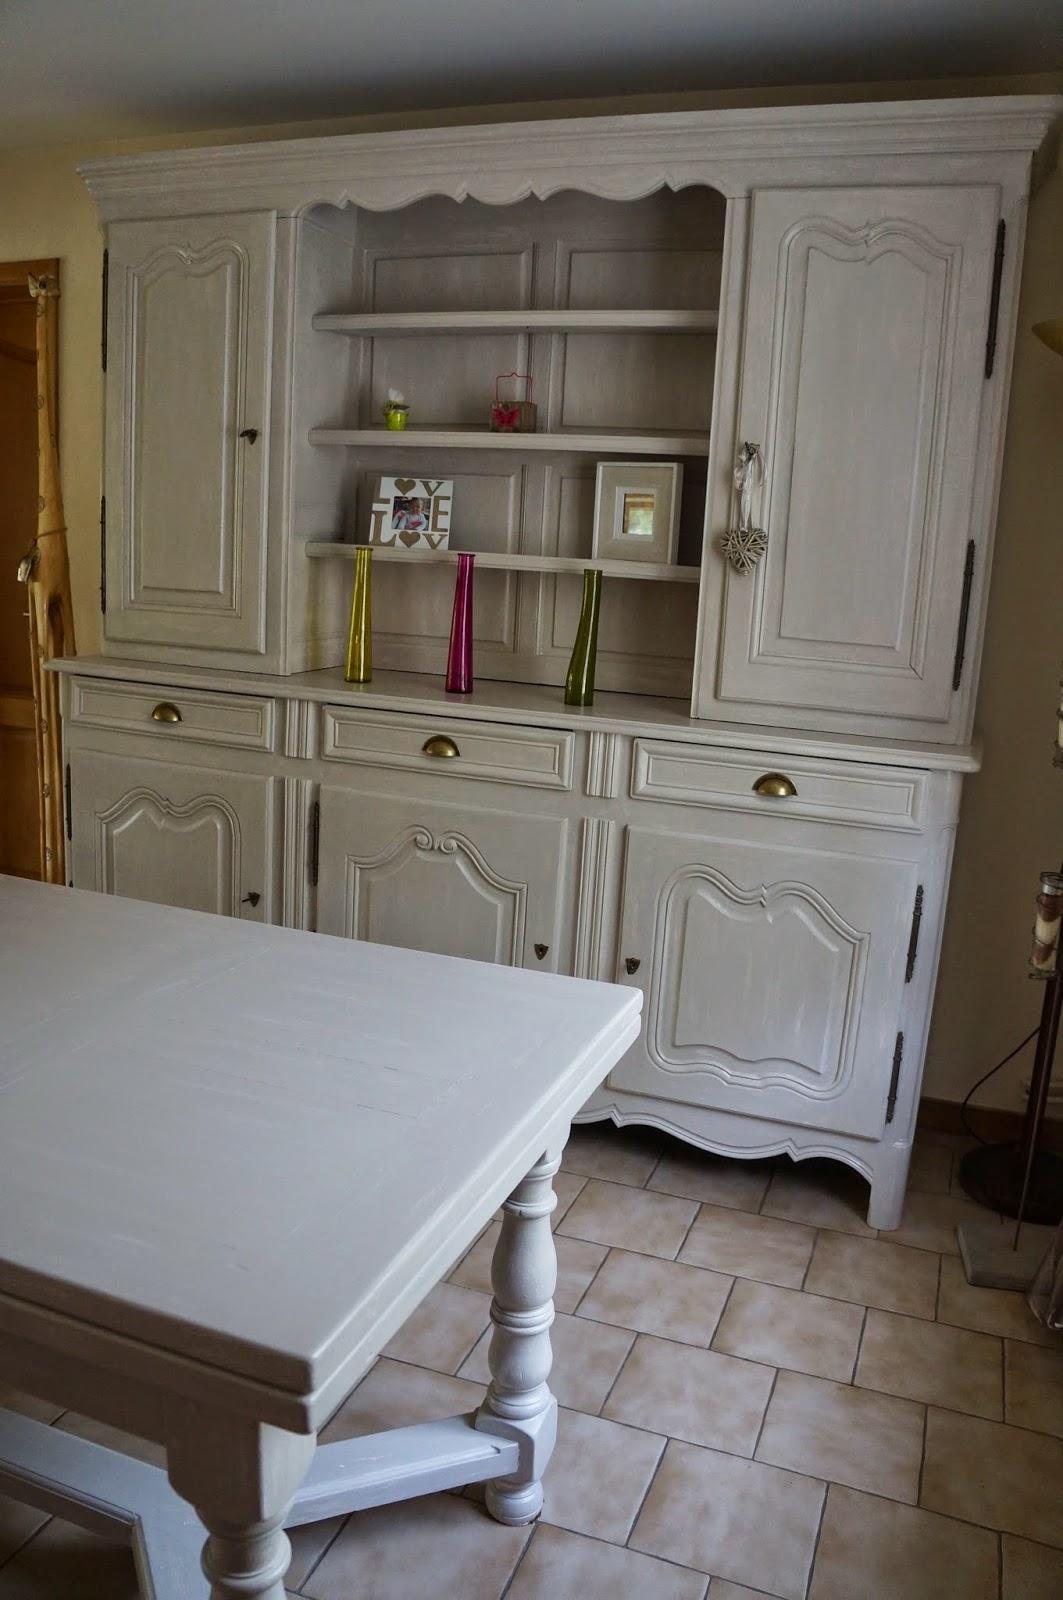 salle-à-manger-relookée-rénovée-patinée-urlu-et-berlu